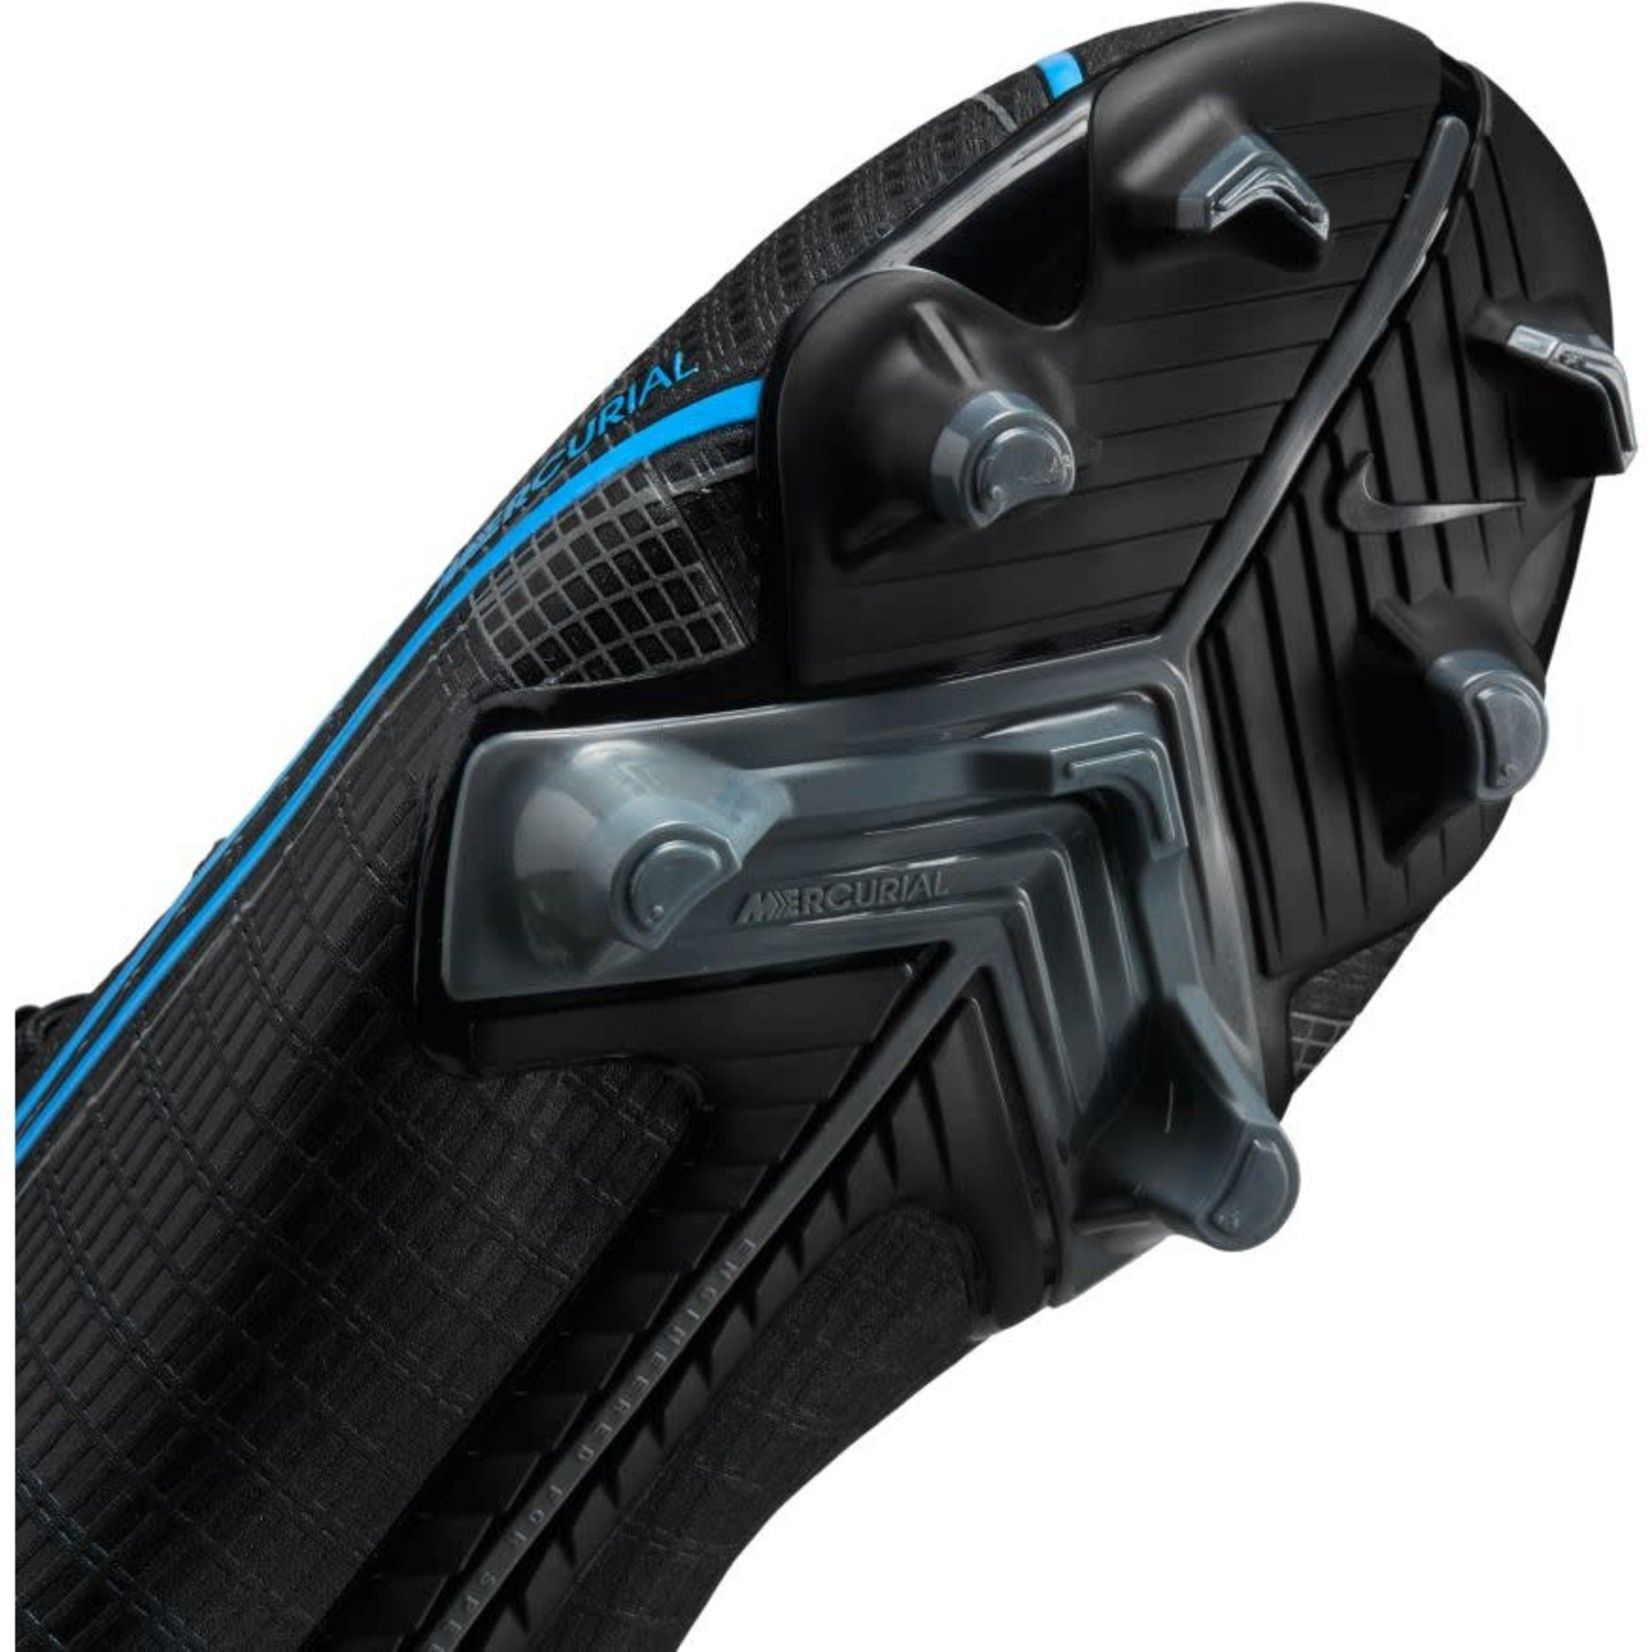 NIKE MERCURIAL SUPERFLY 8 ACADEMY MG JR (BLACK/BLUE)